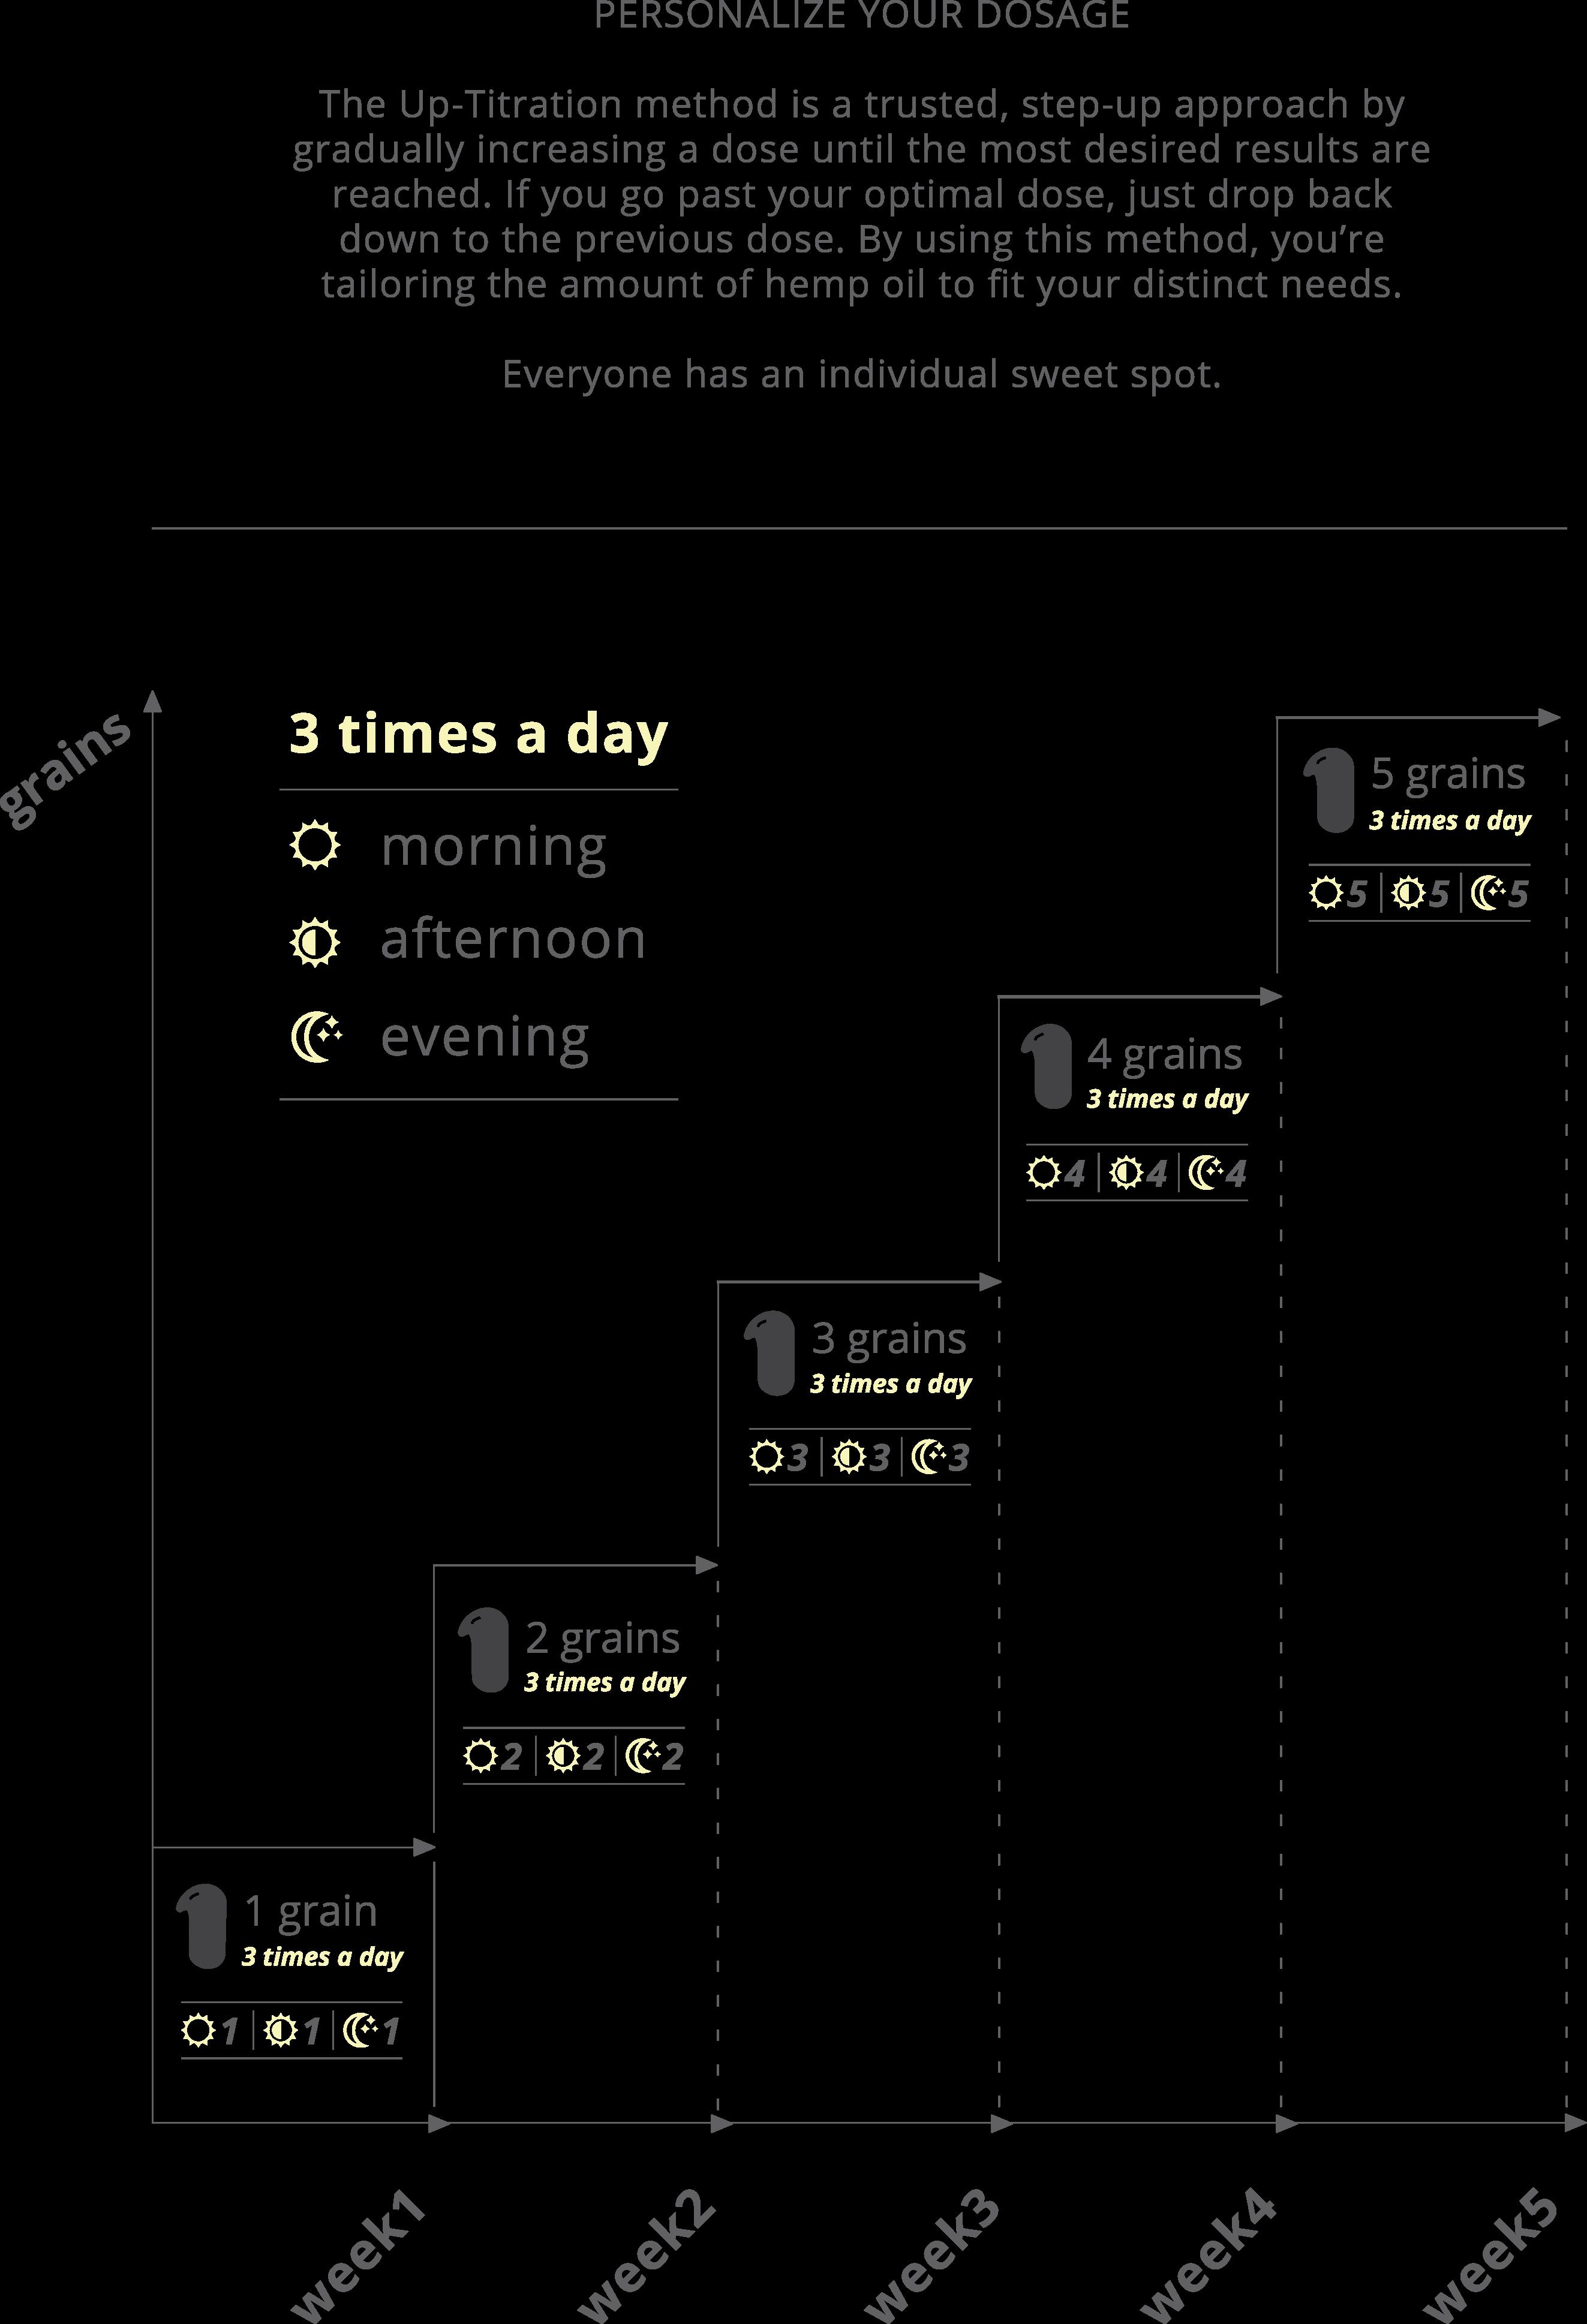 extract infographic